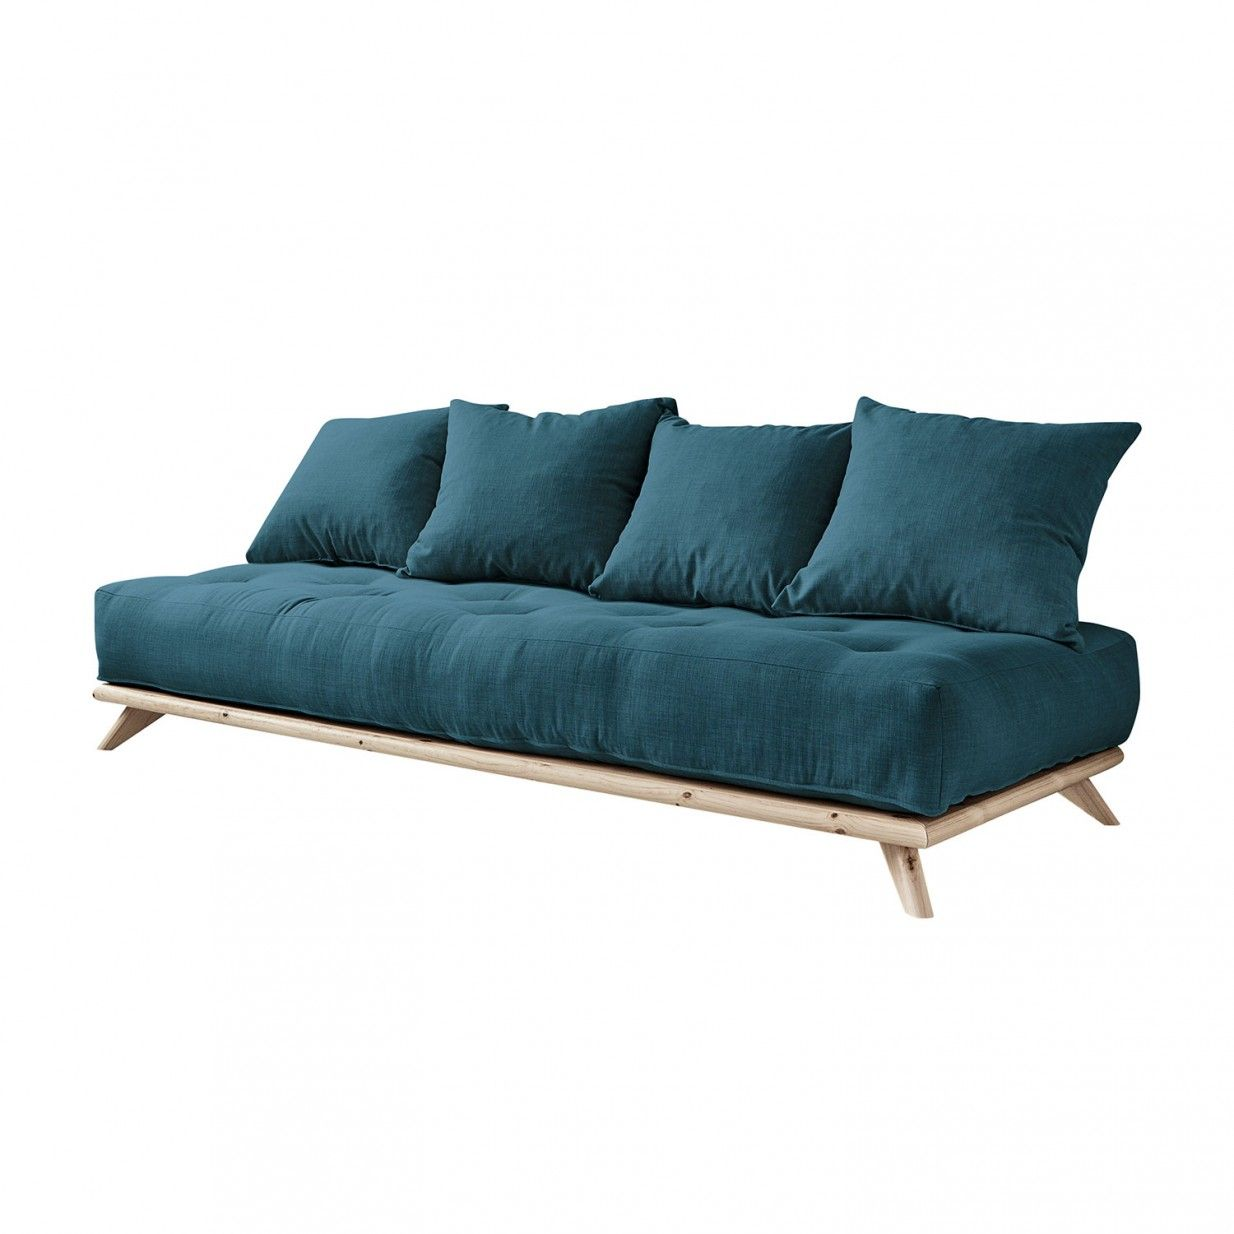 Senza Sofa Blau Karup Sofa Outdoor Sofa Furniture